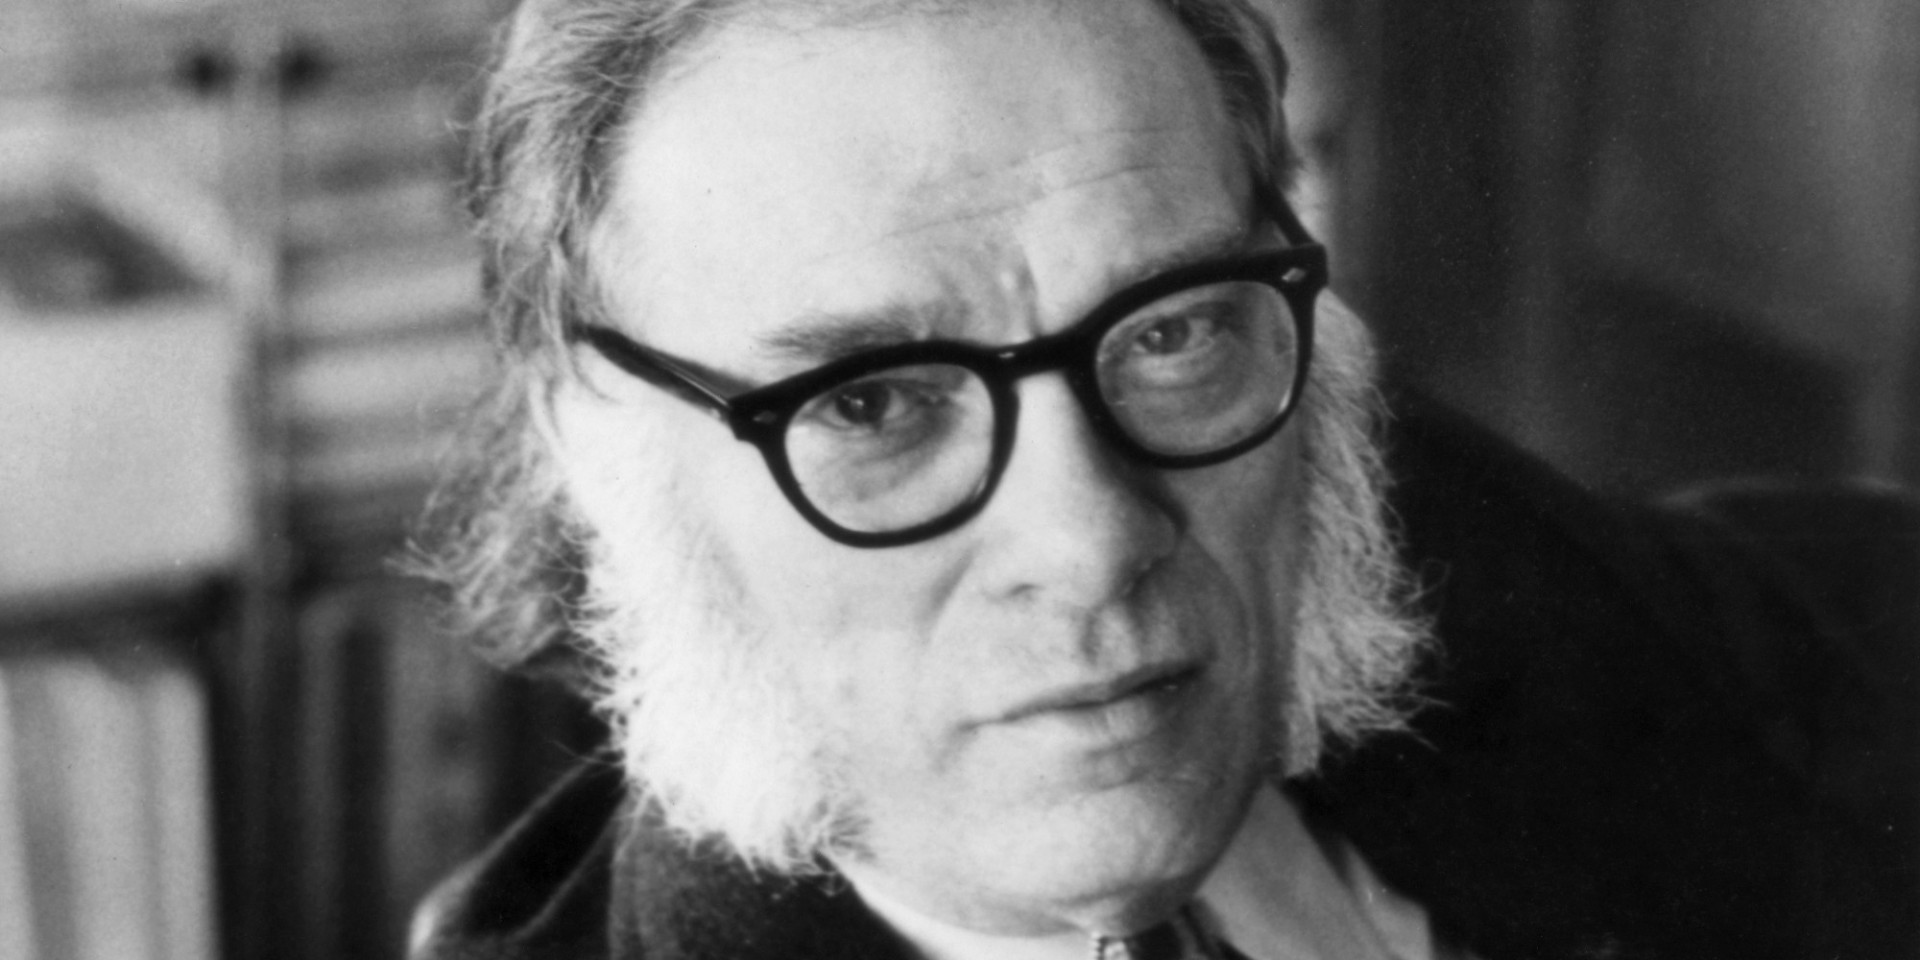 Portrait of the american biochemist and writer Isaac Asimov. USA, 1970s (Photo by Mondadori Portfolio via Getty Images)